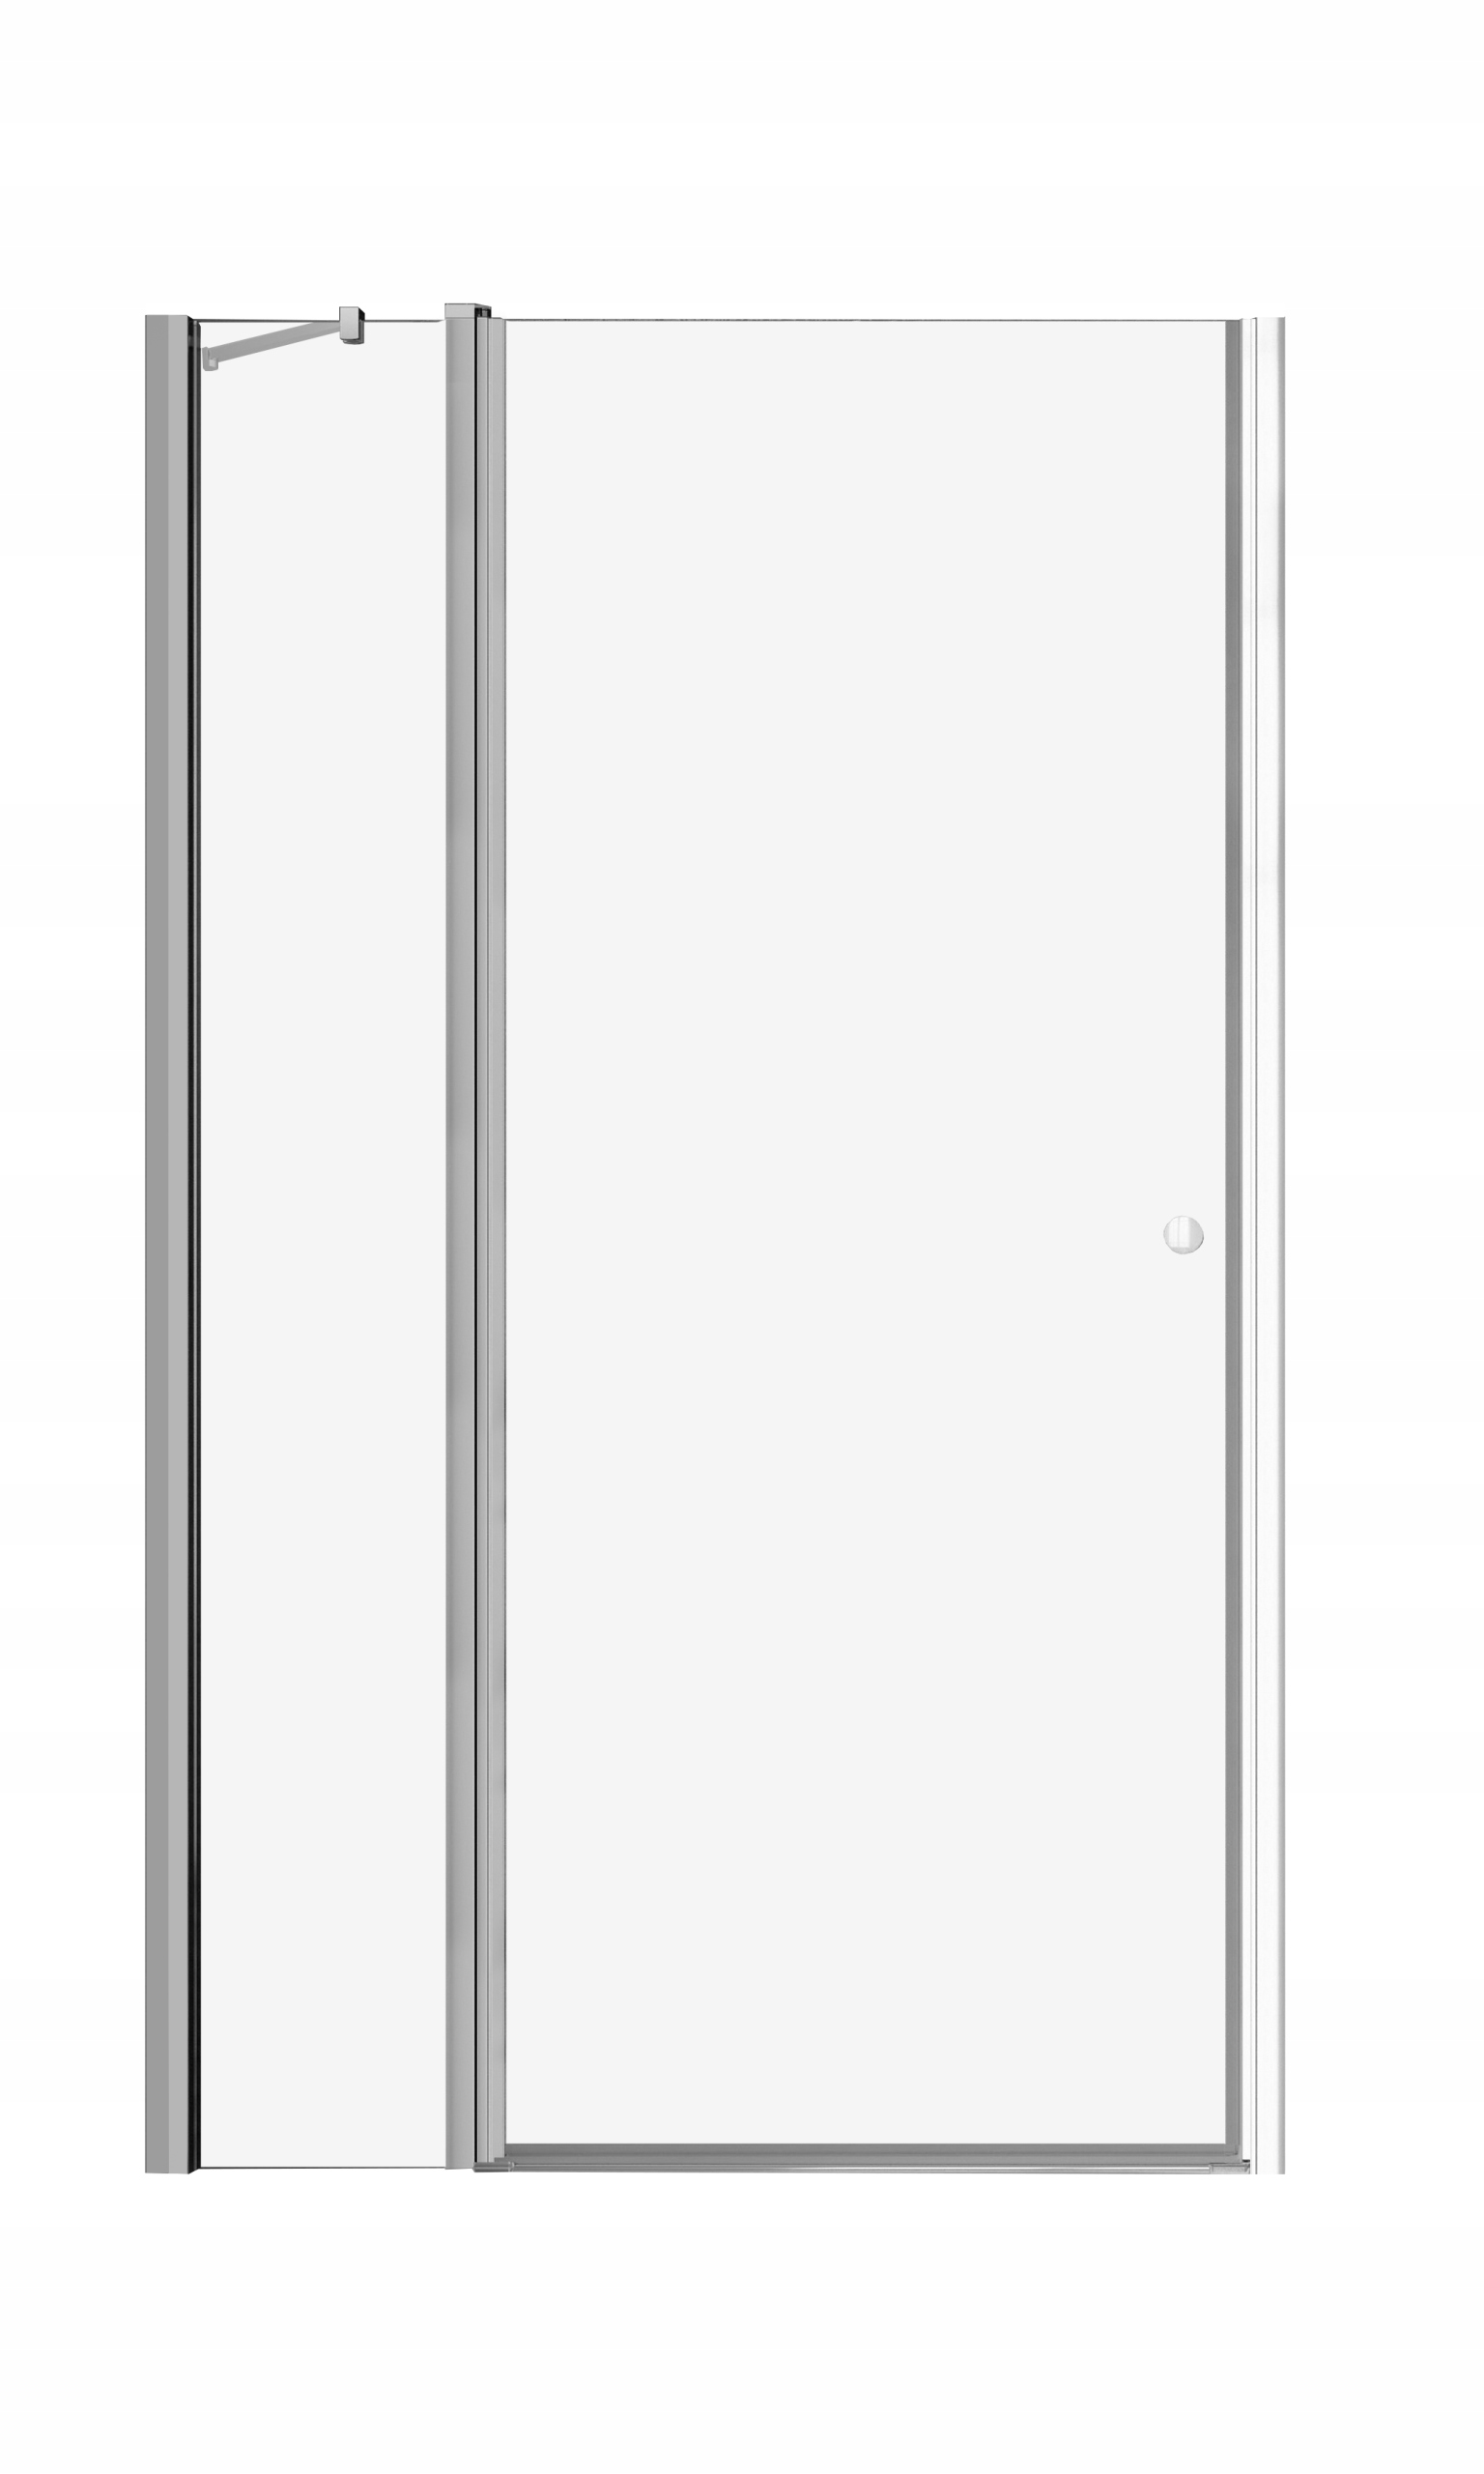 Sprchové dvere Eos II DWJ 110x195 cm RADAWAY